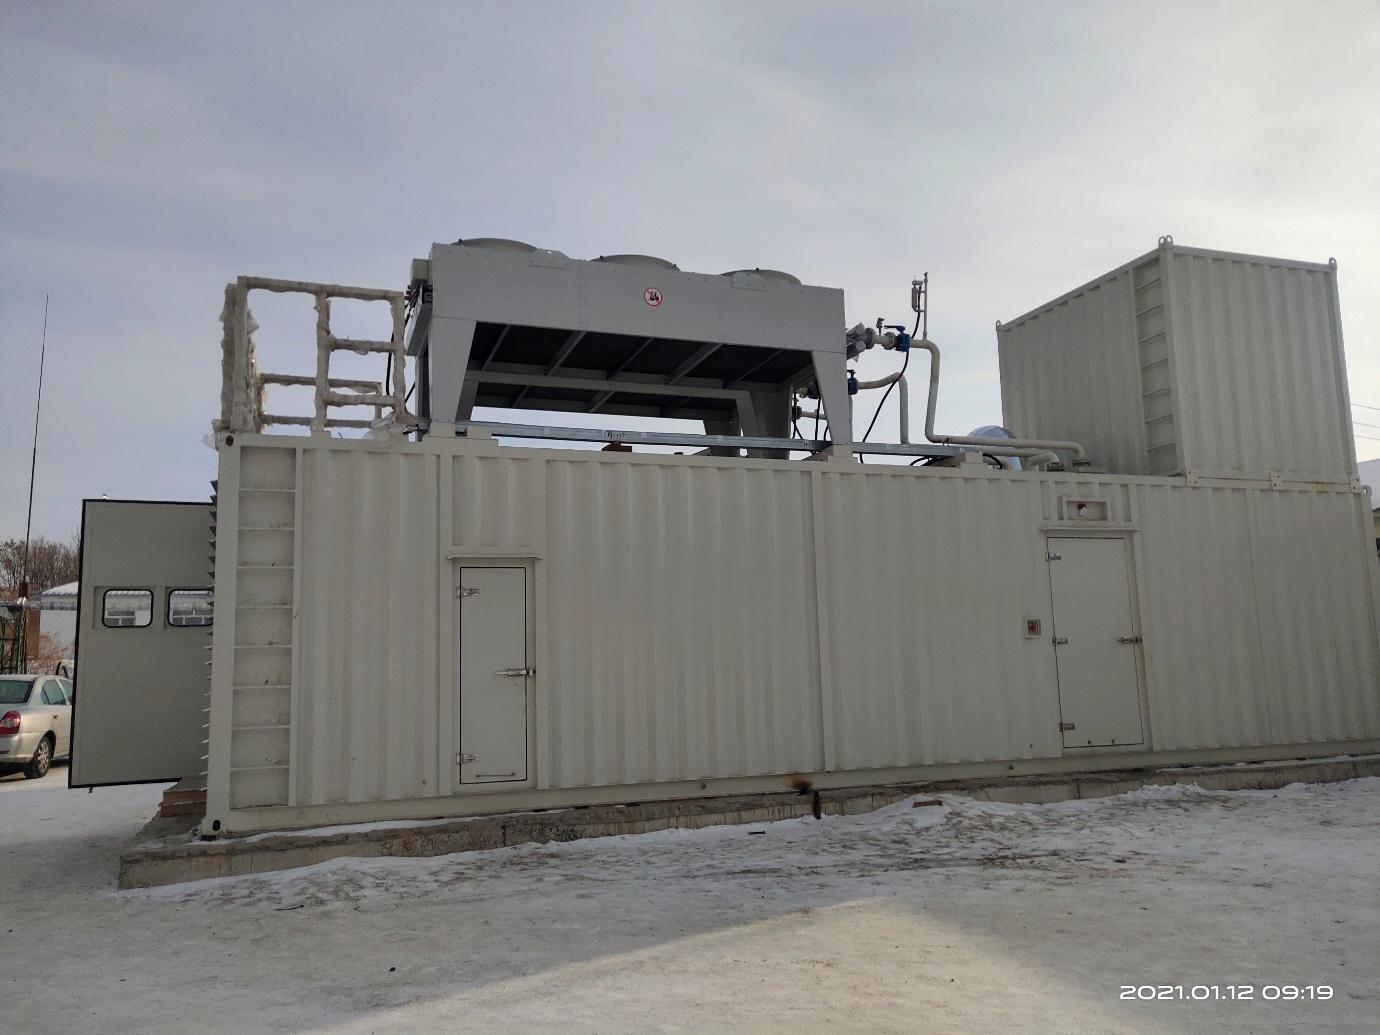 C:\Zhang Yue\市场\Wechat\发布内容\2021\20210122-MWM燃气发电机组无畏严寒地区条件,成功投入运行!\1705257469.jpg